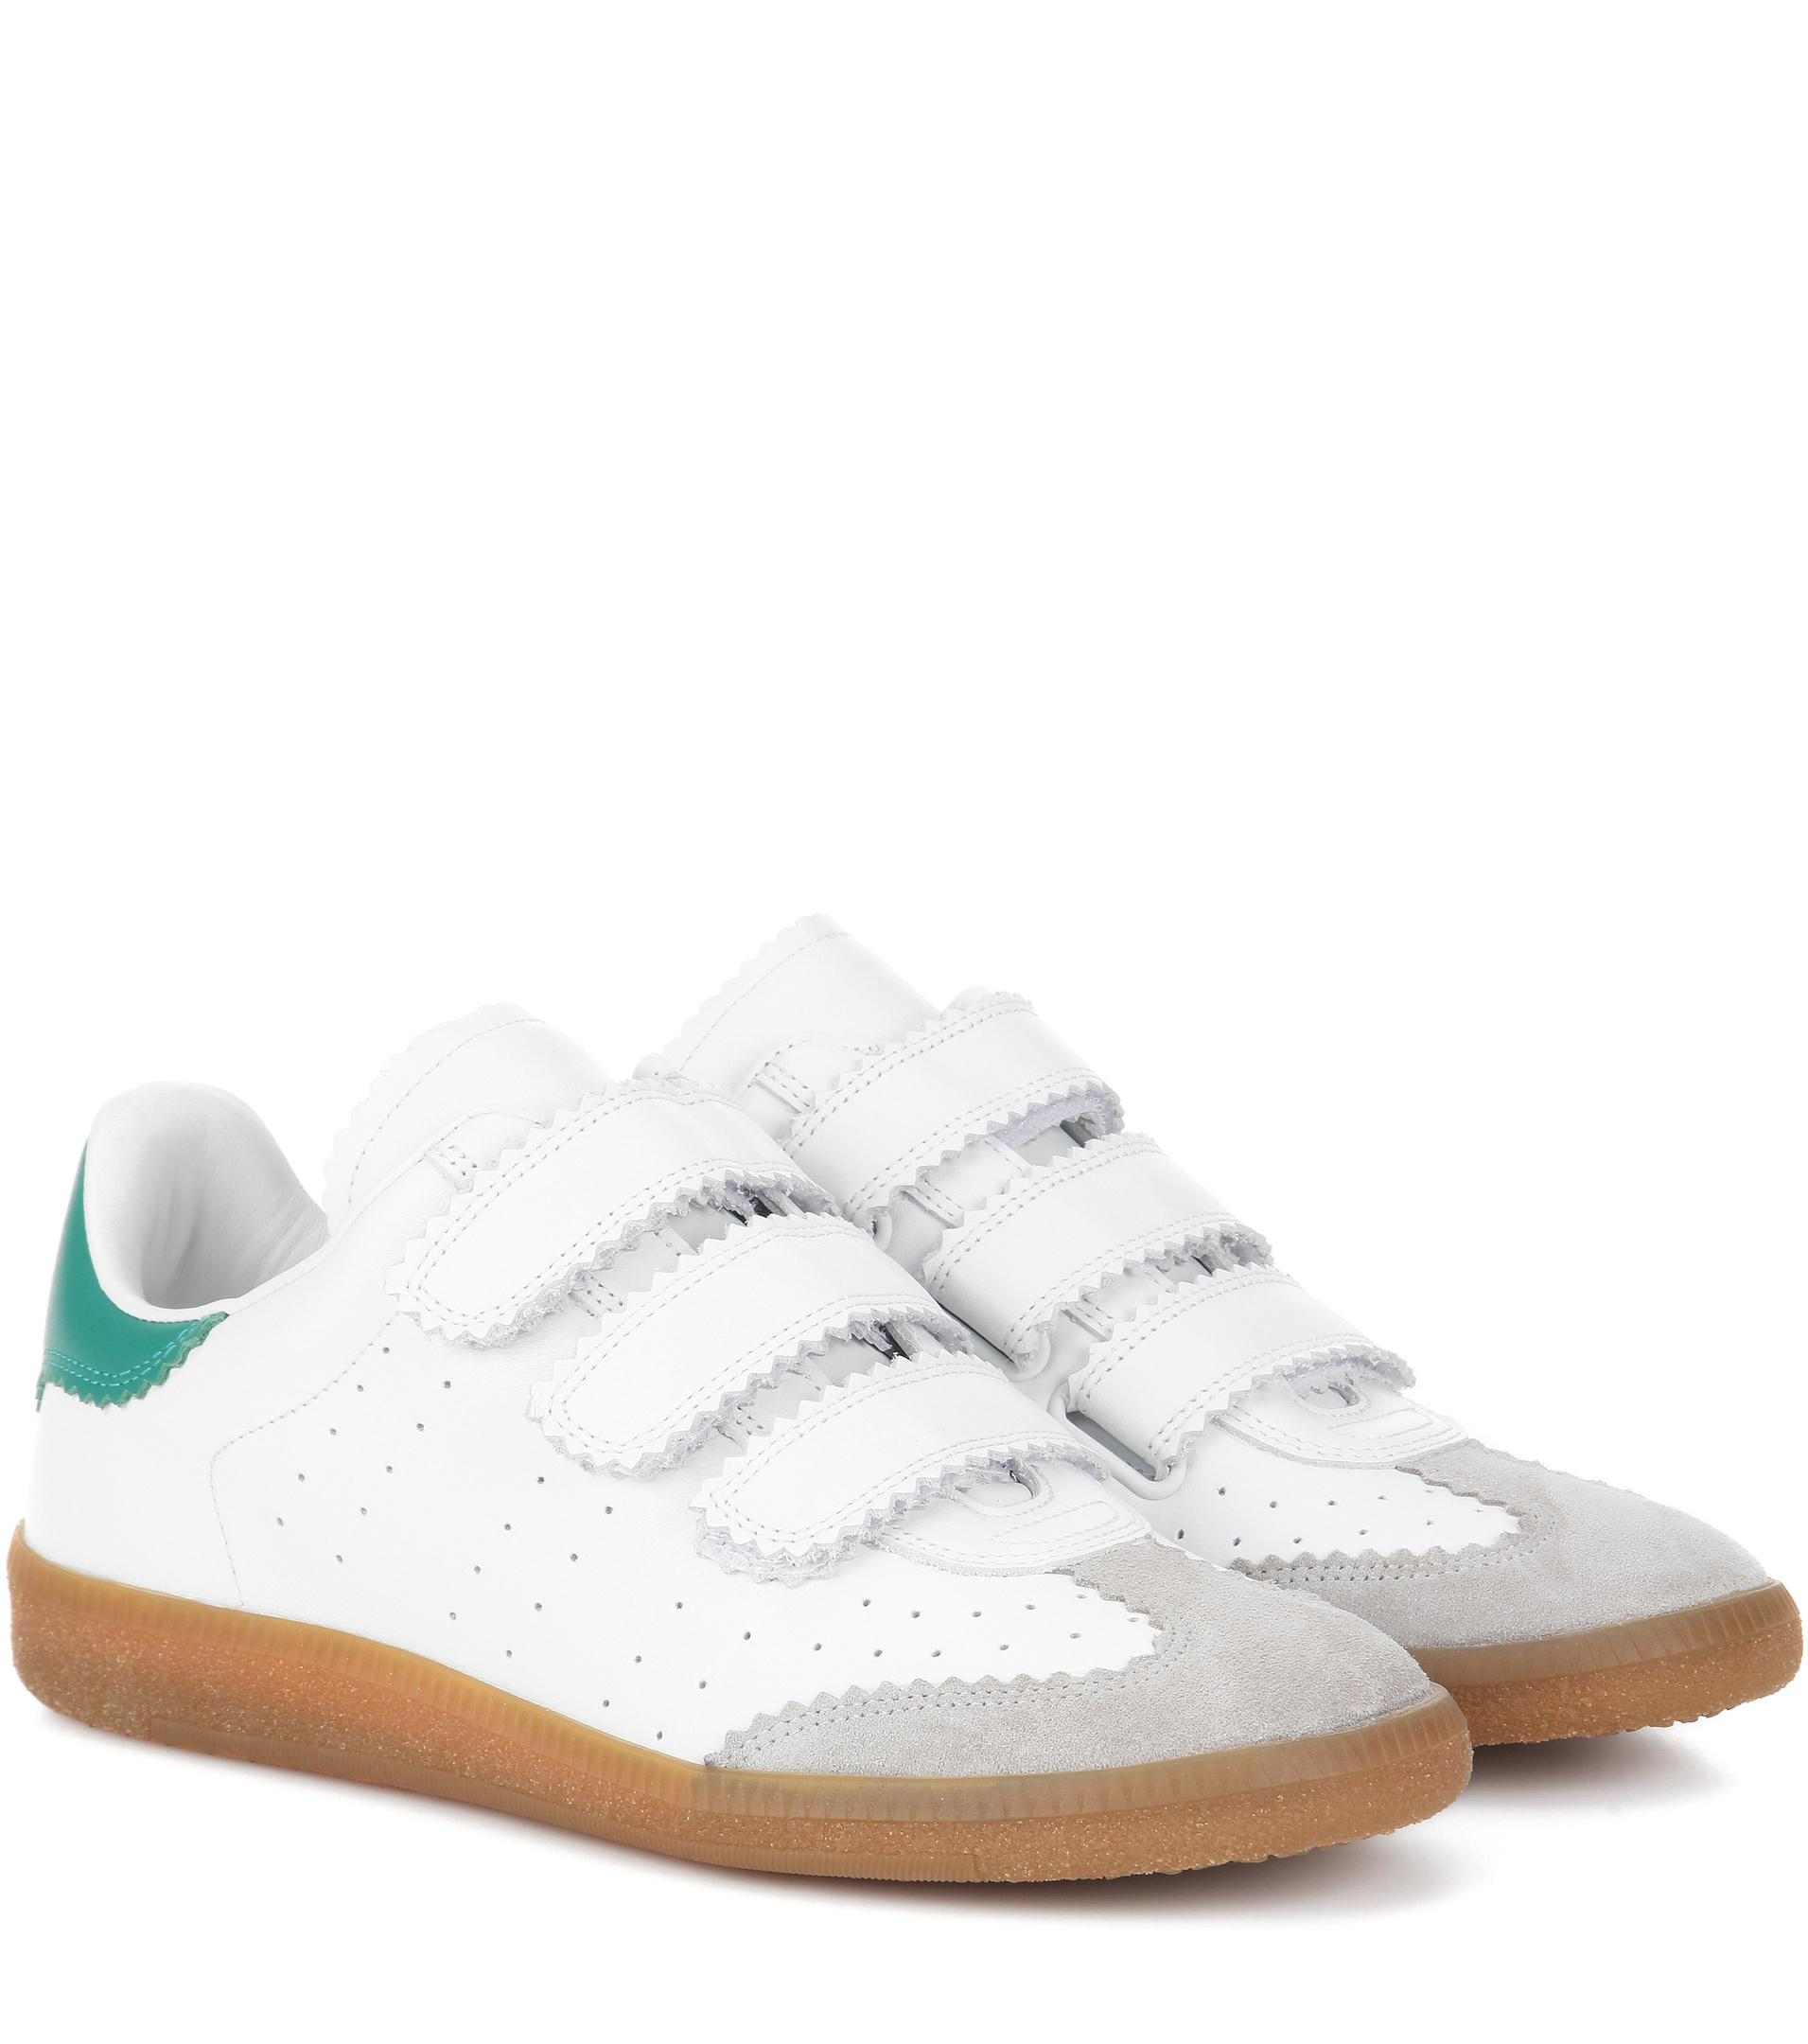 Isabel Marant ‰ Ã Sneakers Matériau Toile Mix - Blanc XeEnCZGjF